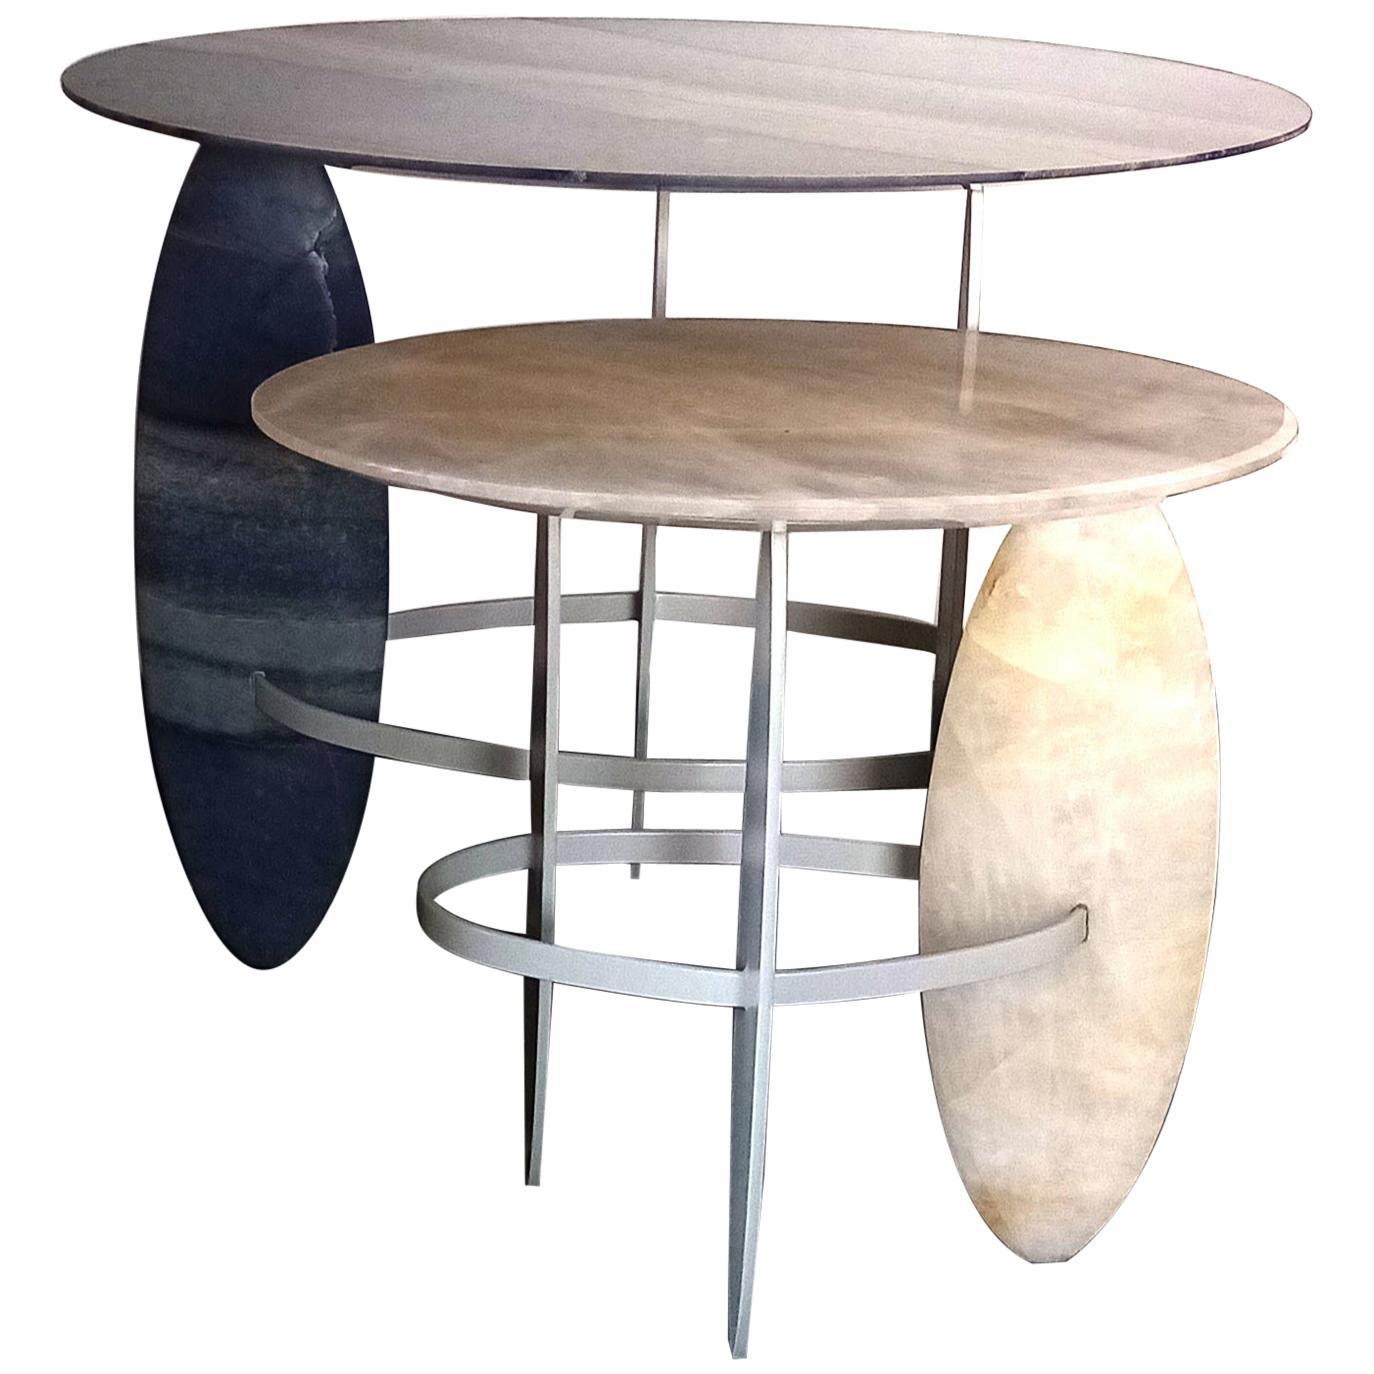 Pablina side table set    HAND SCULPTED QUARTZITE AND QUARTZ